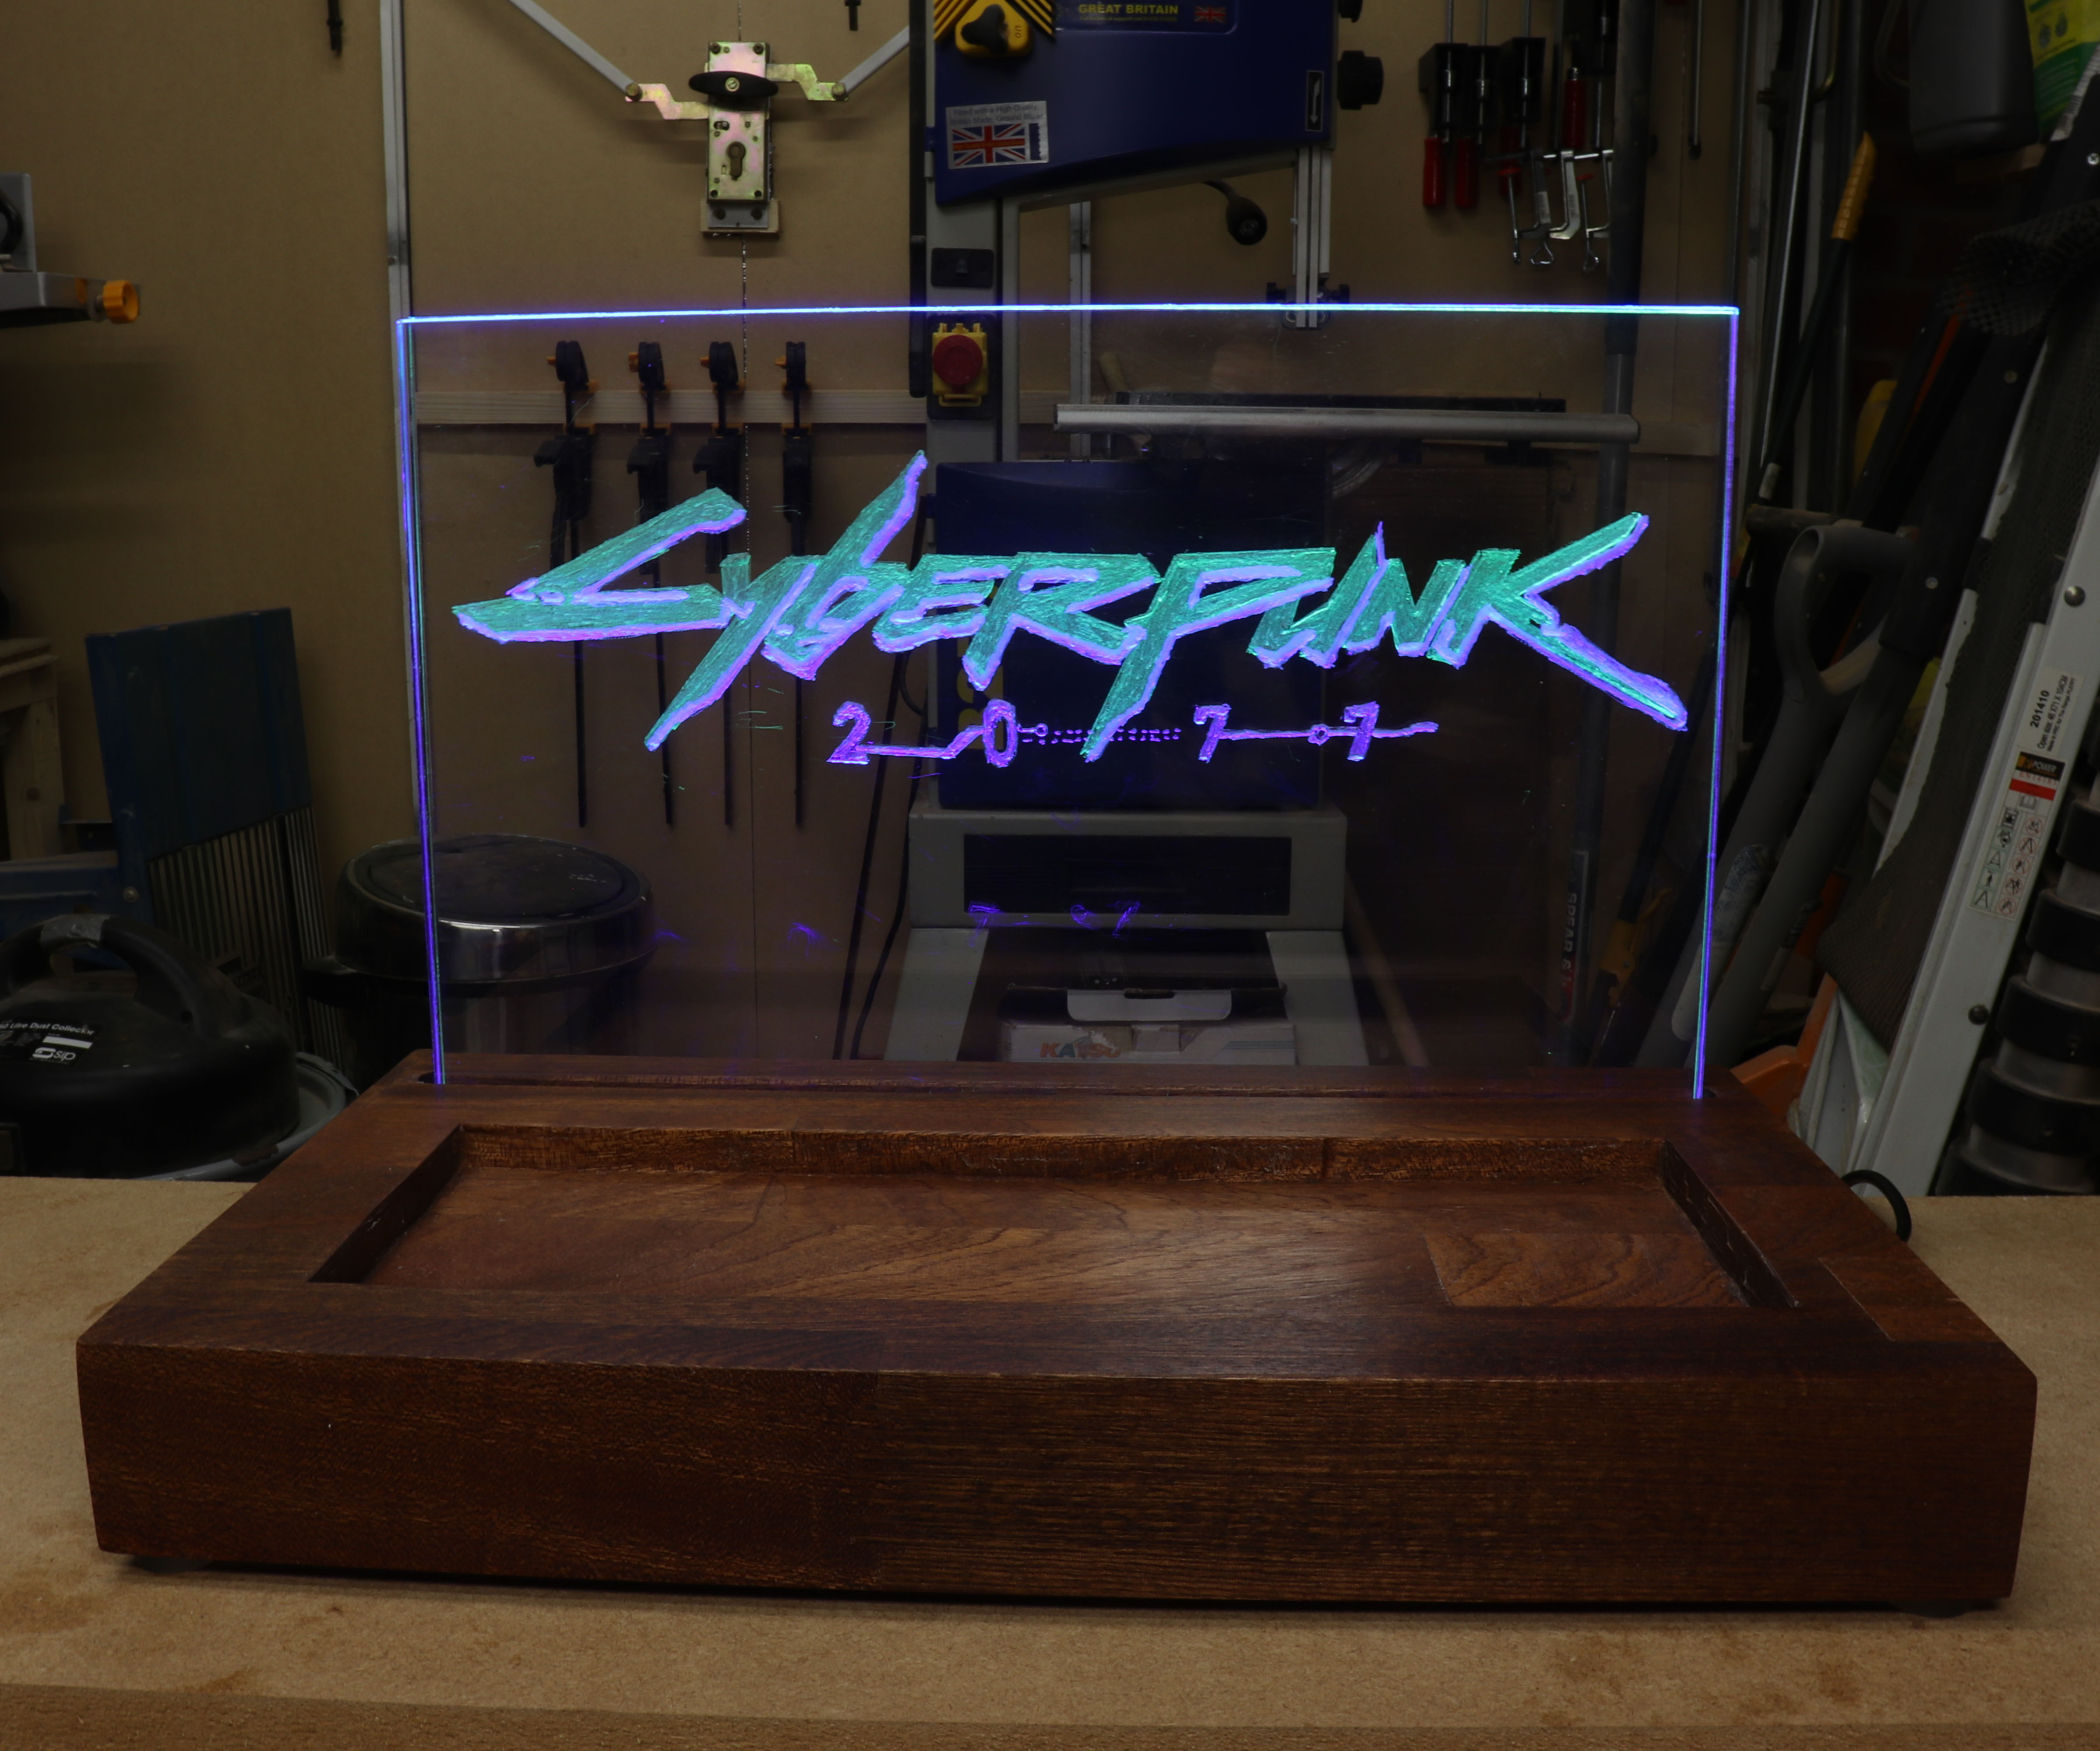 Cyberpunk 2077 Themed LED Light